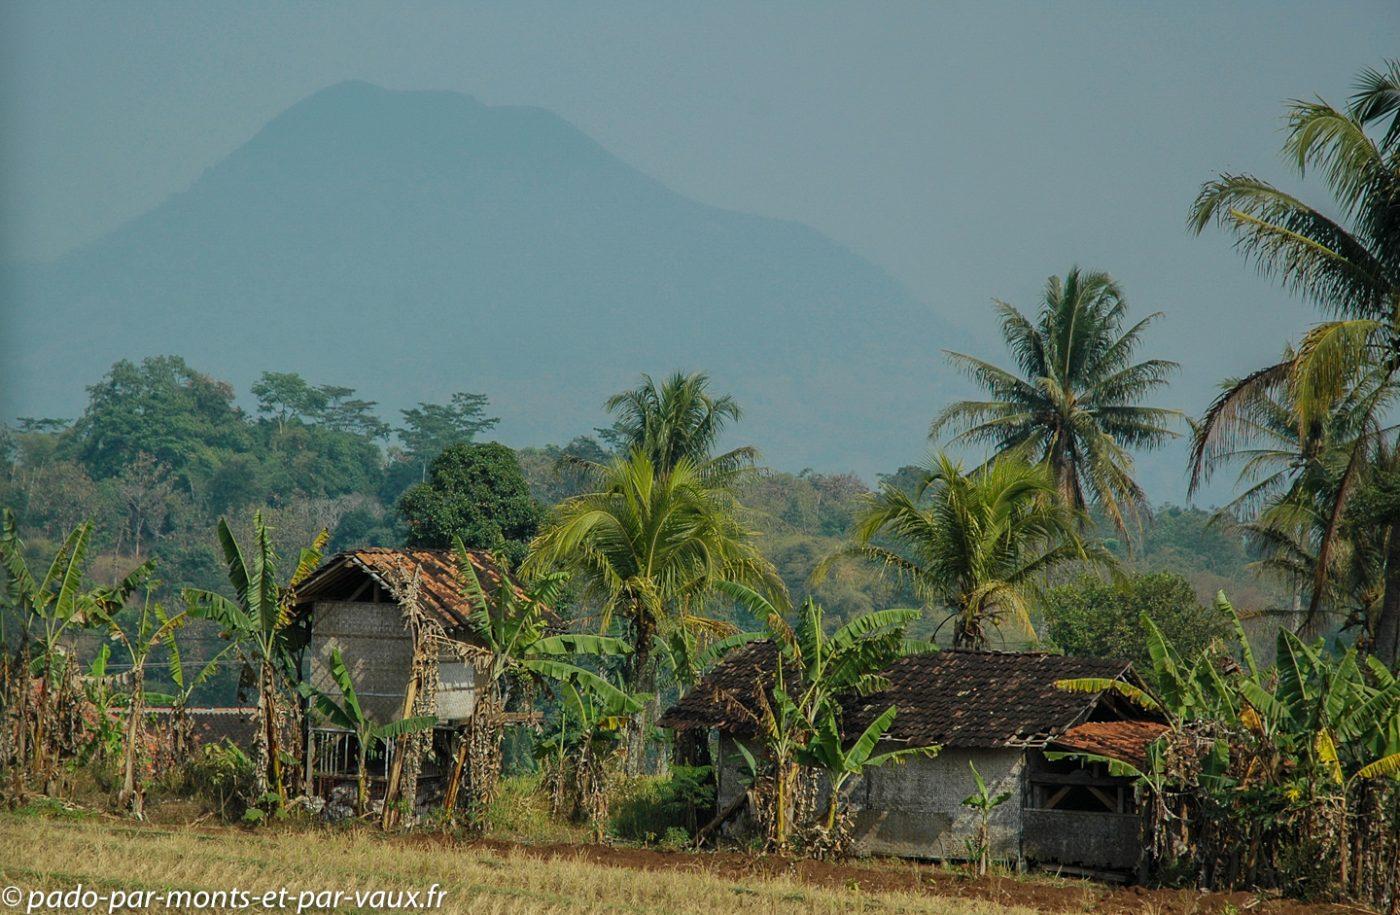 Bandung - Yogyakarta